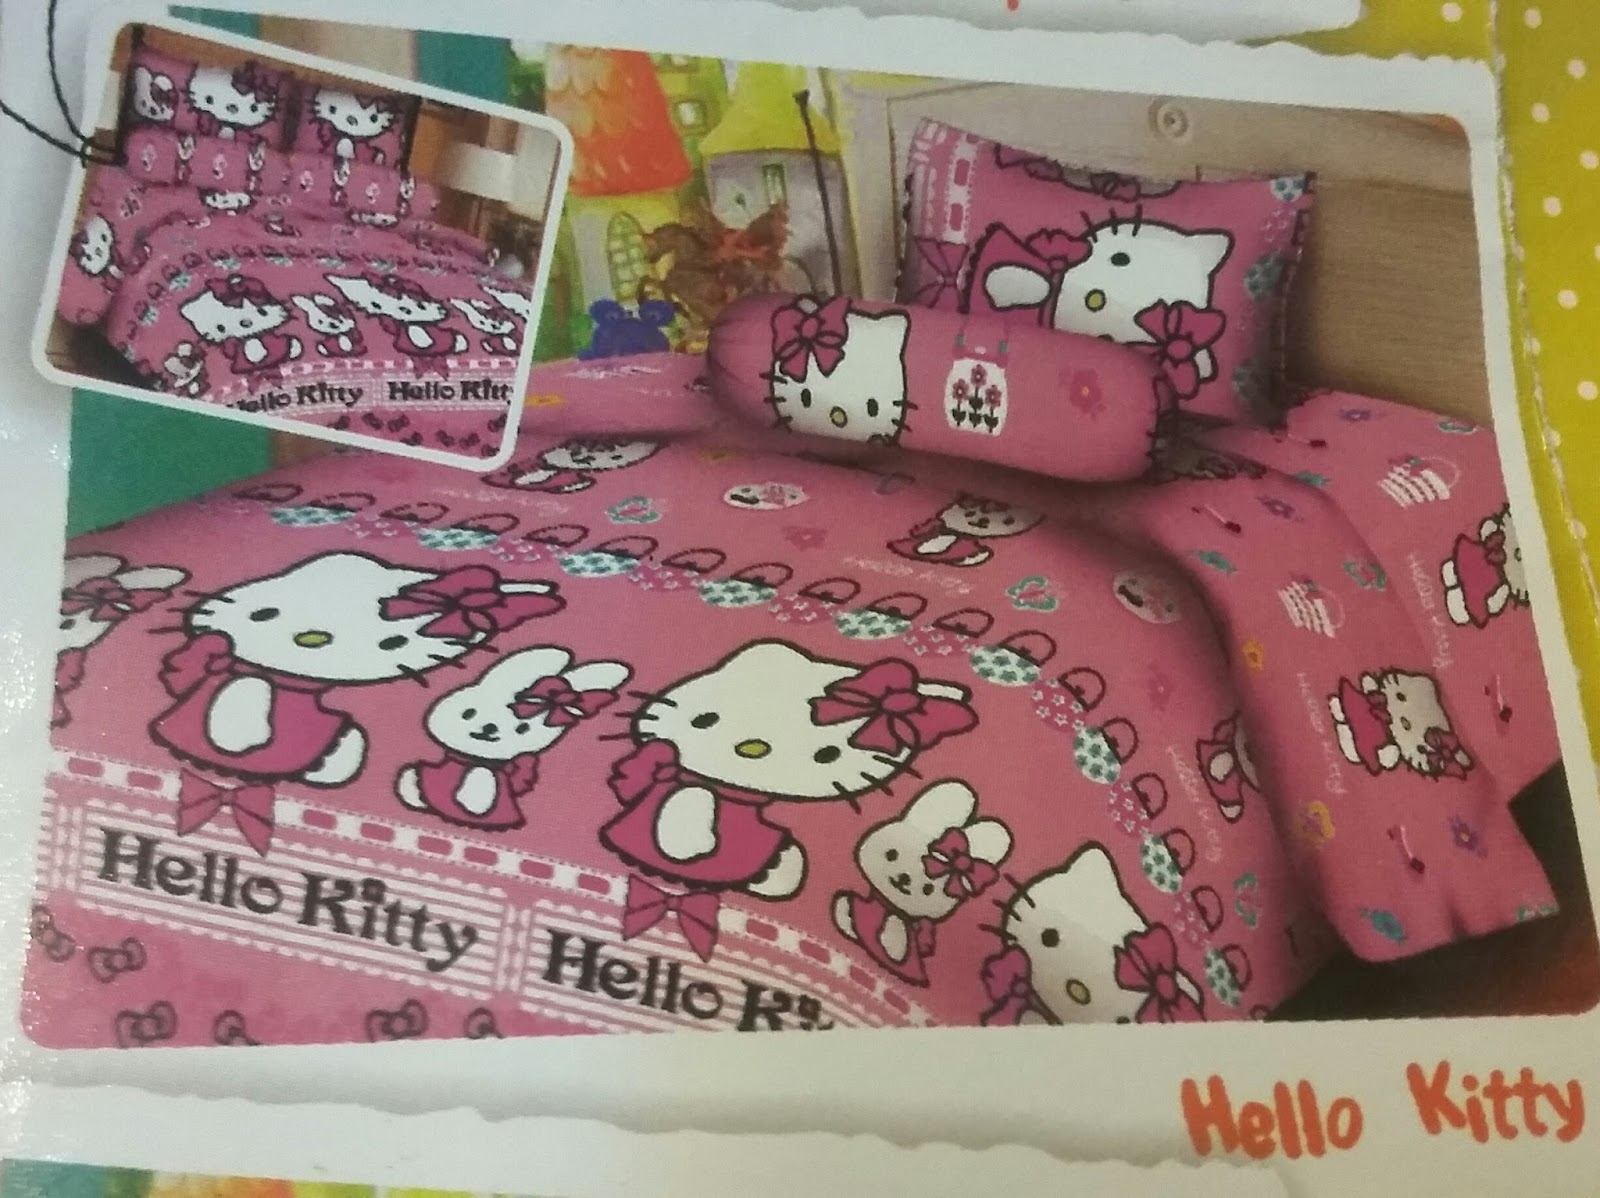 Ning Prima Batik Sprei Hello Kitty Seprei Kami Menyediakan Dengan Motif Yg Beraneka Ragam Minat Lngsung Call Yaa 085743041750 Ato 5acdd2fa Price 120 80000 160 95000 180 100000